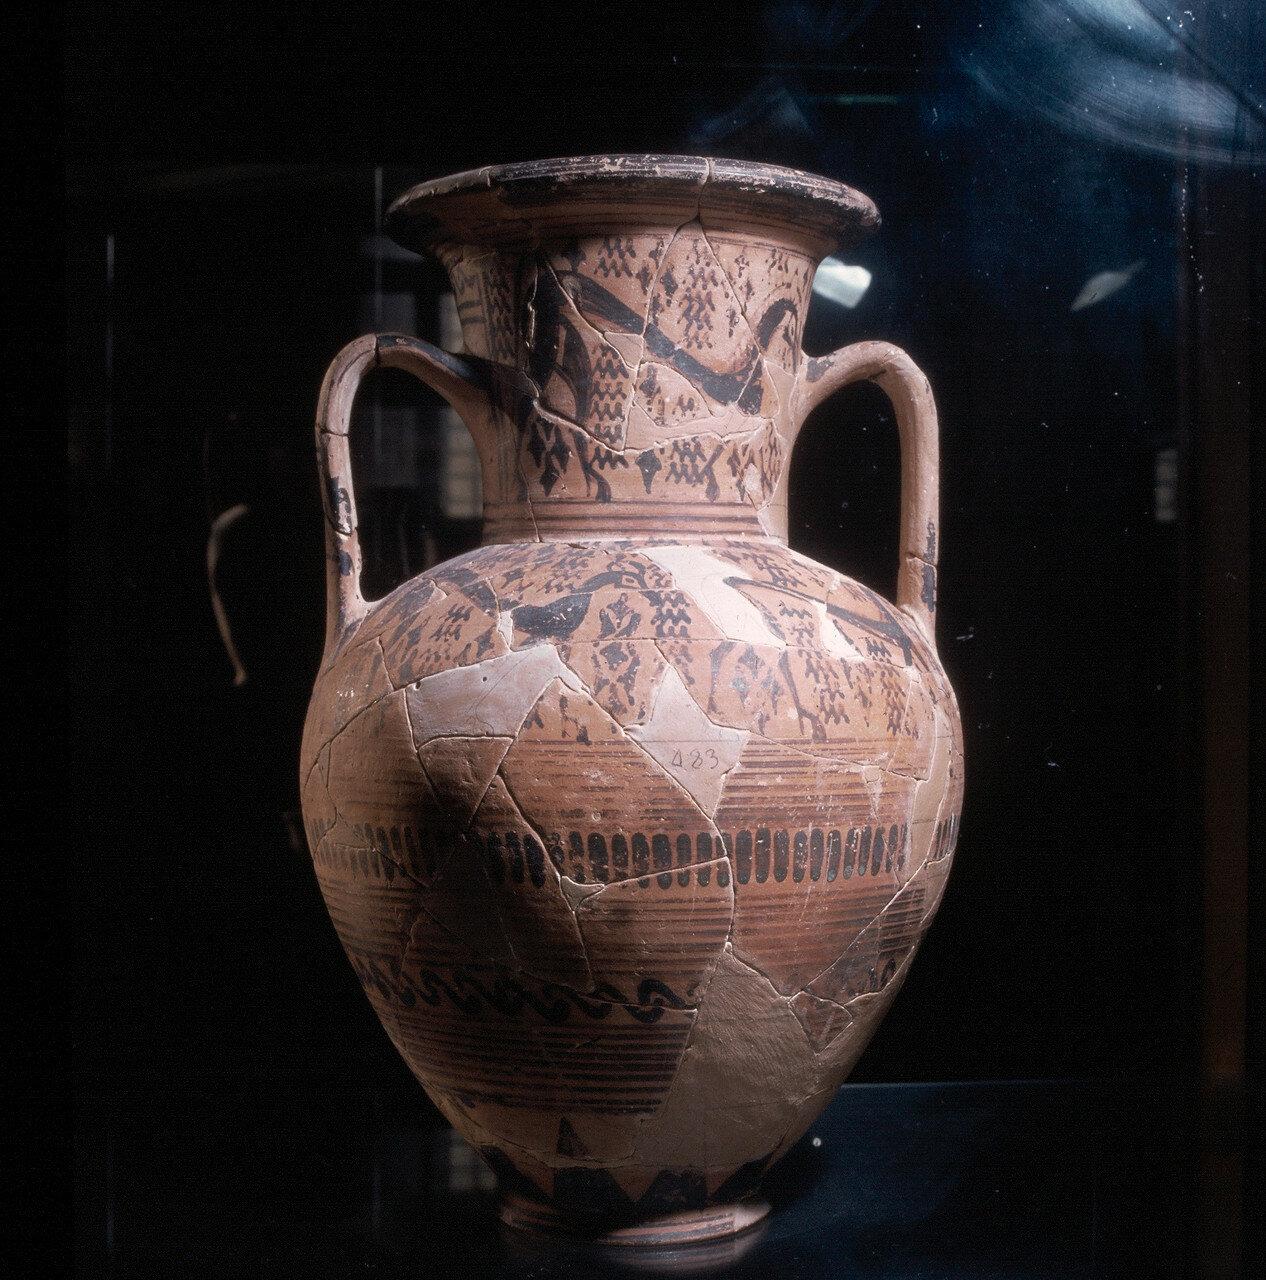 Миконос, Археологический музей. Амфора начала VII в. до н.э.